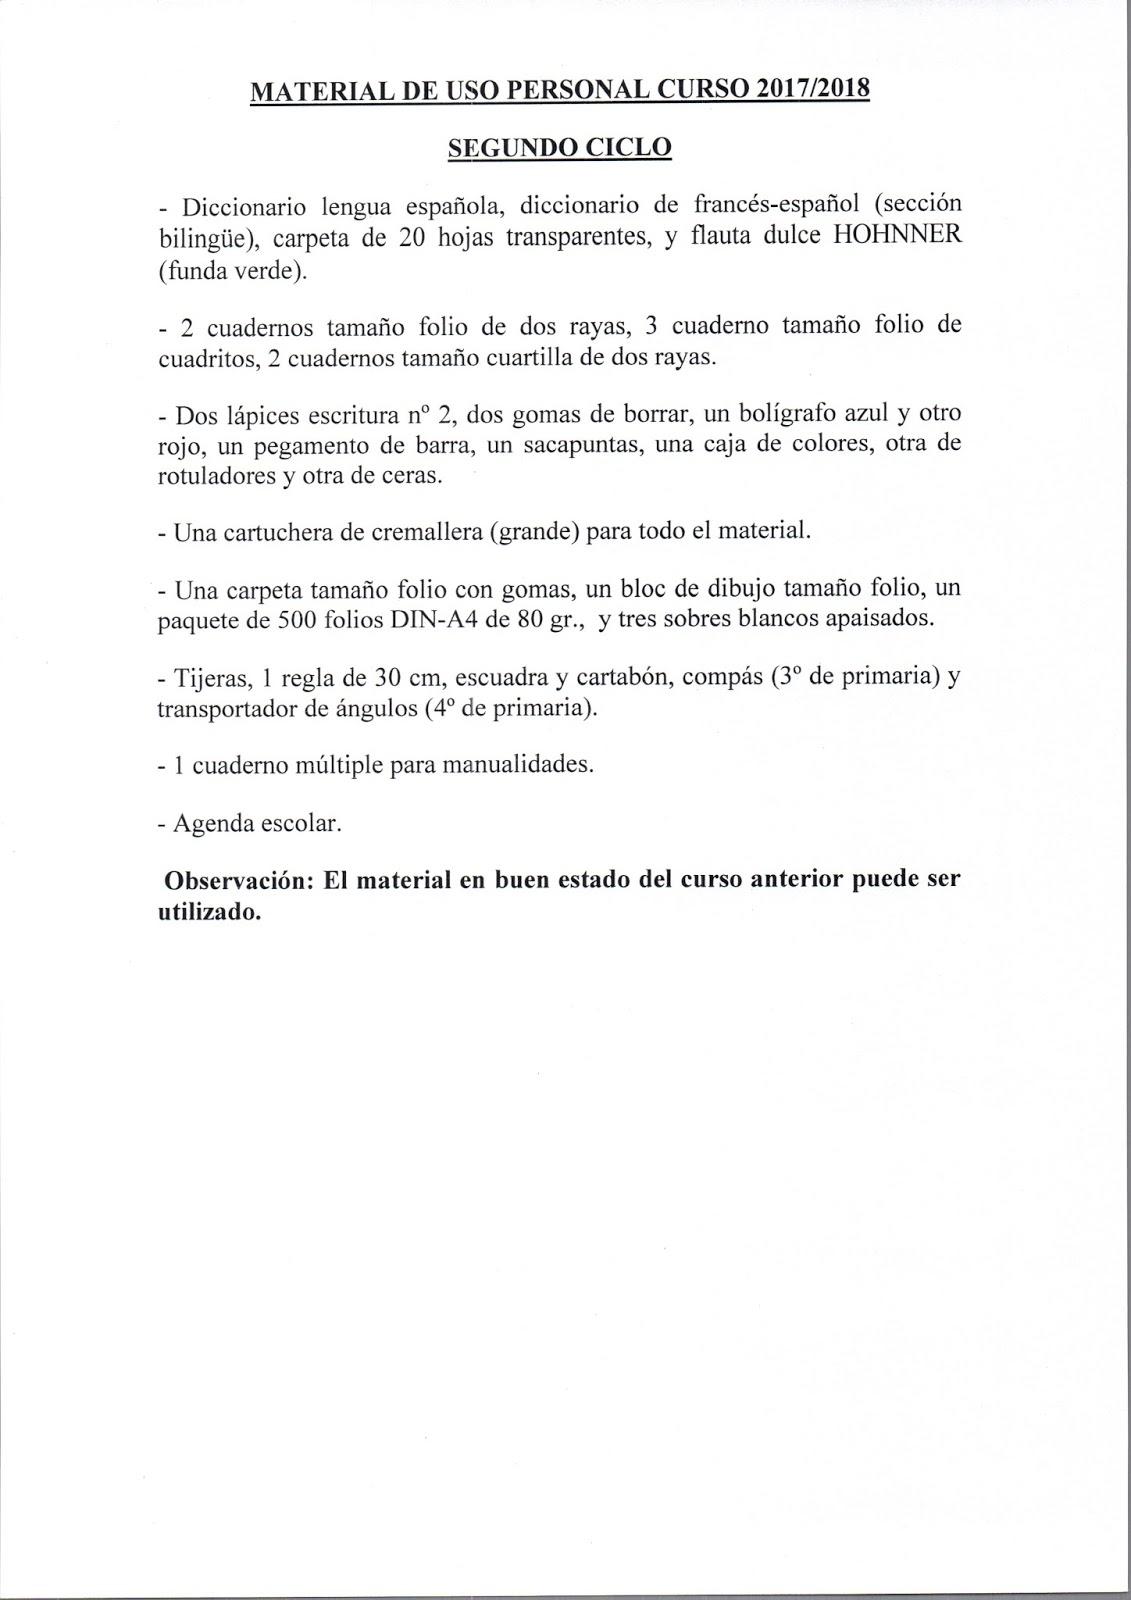 C.E.I.P. Garcia Lorca Málaga: ACTIVIDADES RECOMENDADAS PARA EL VERANO